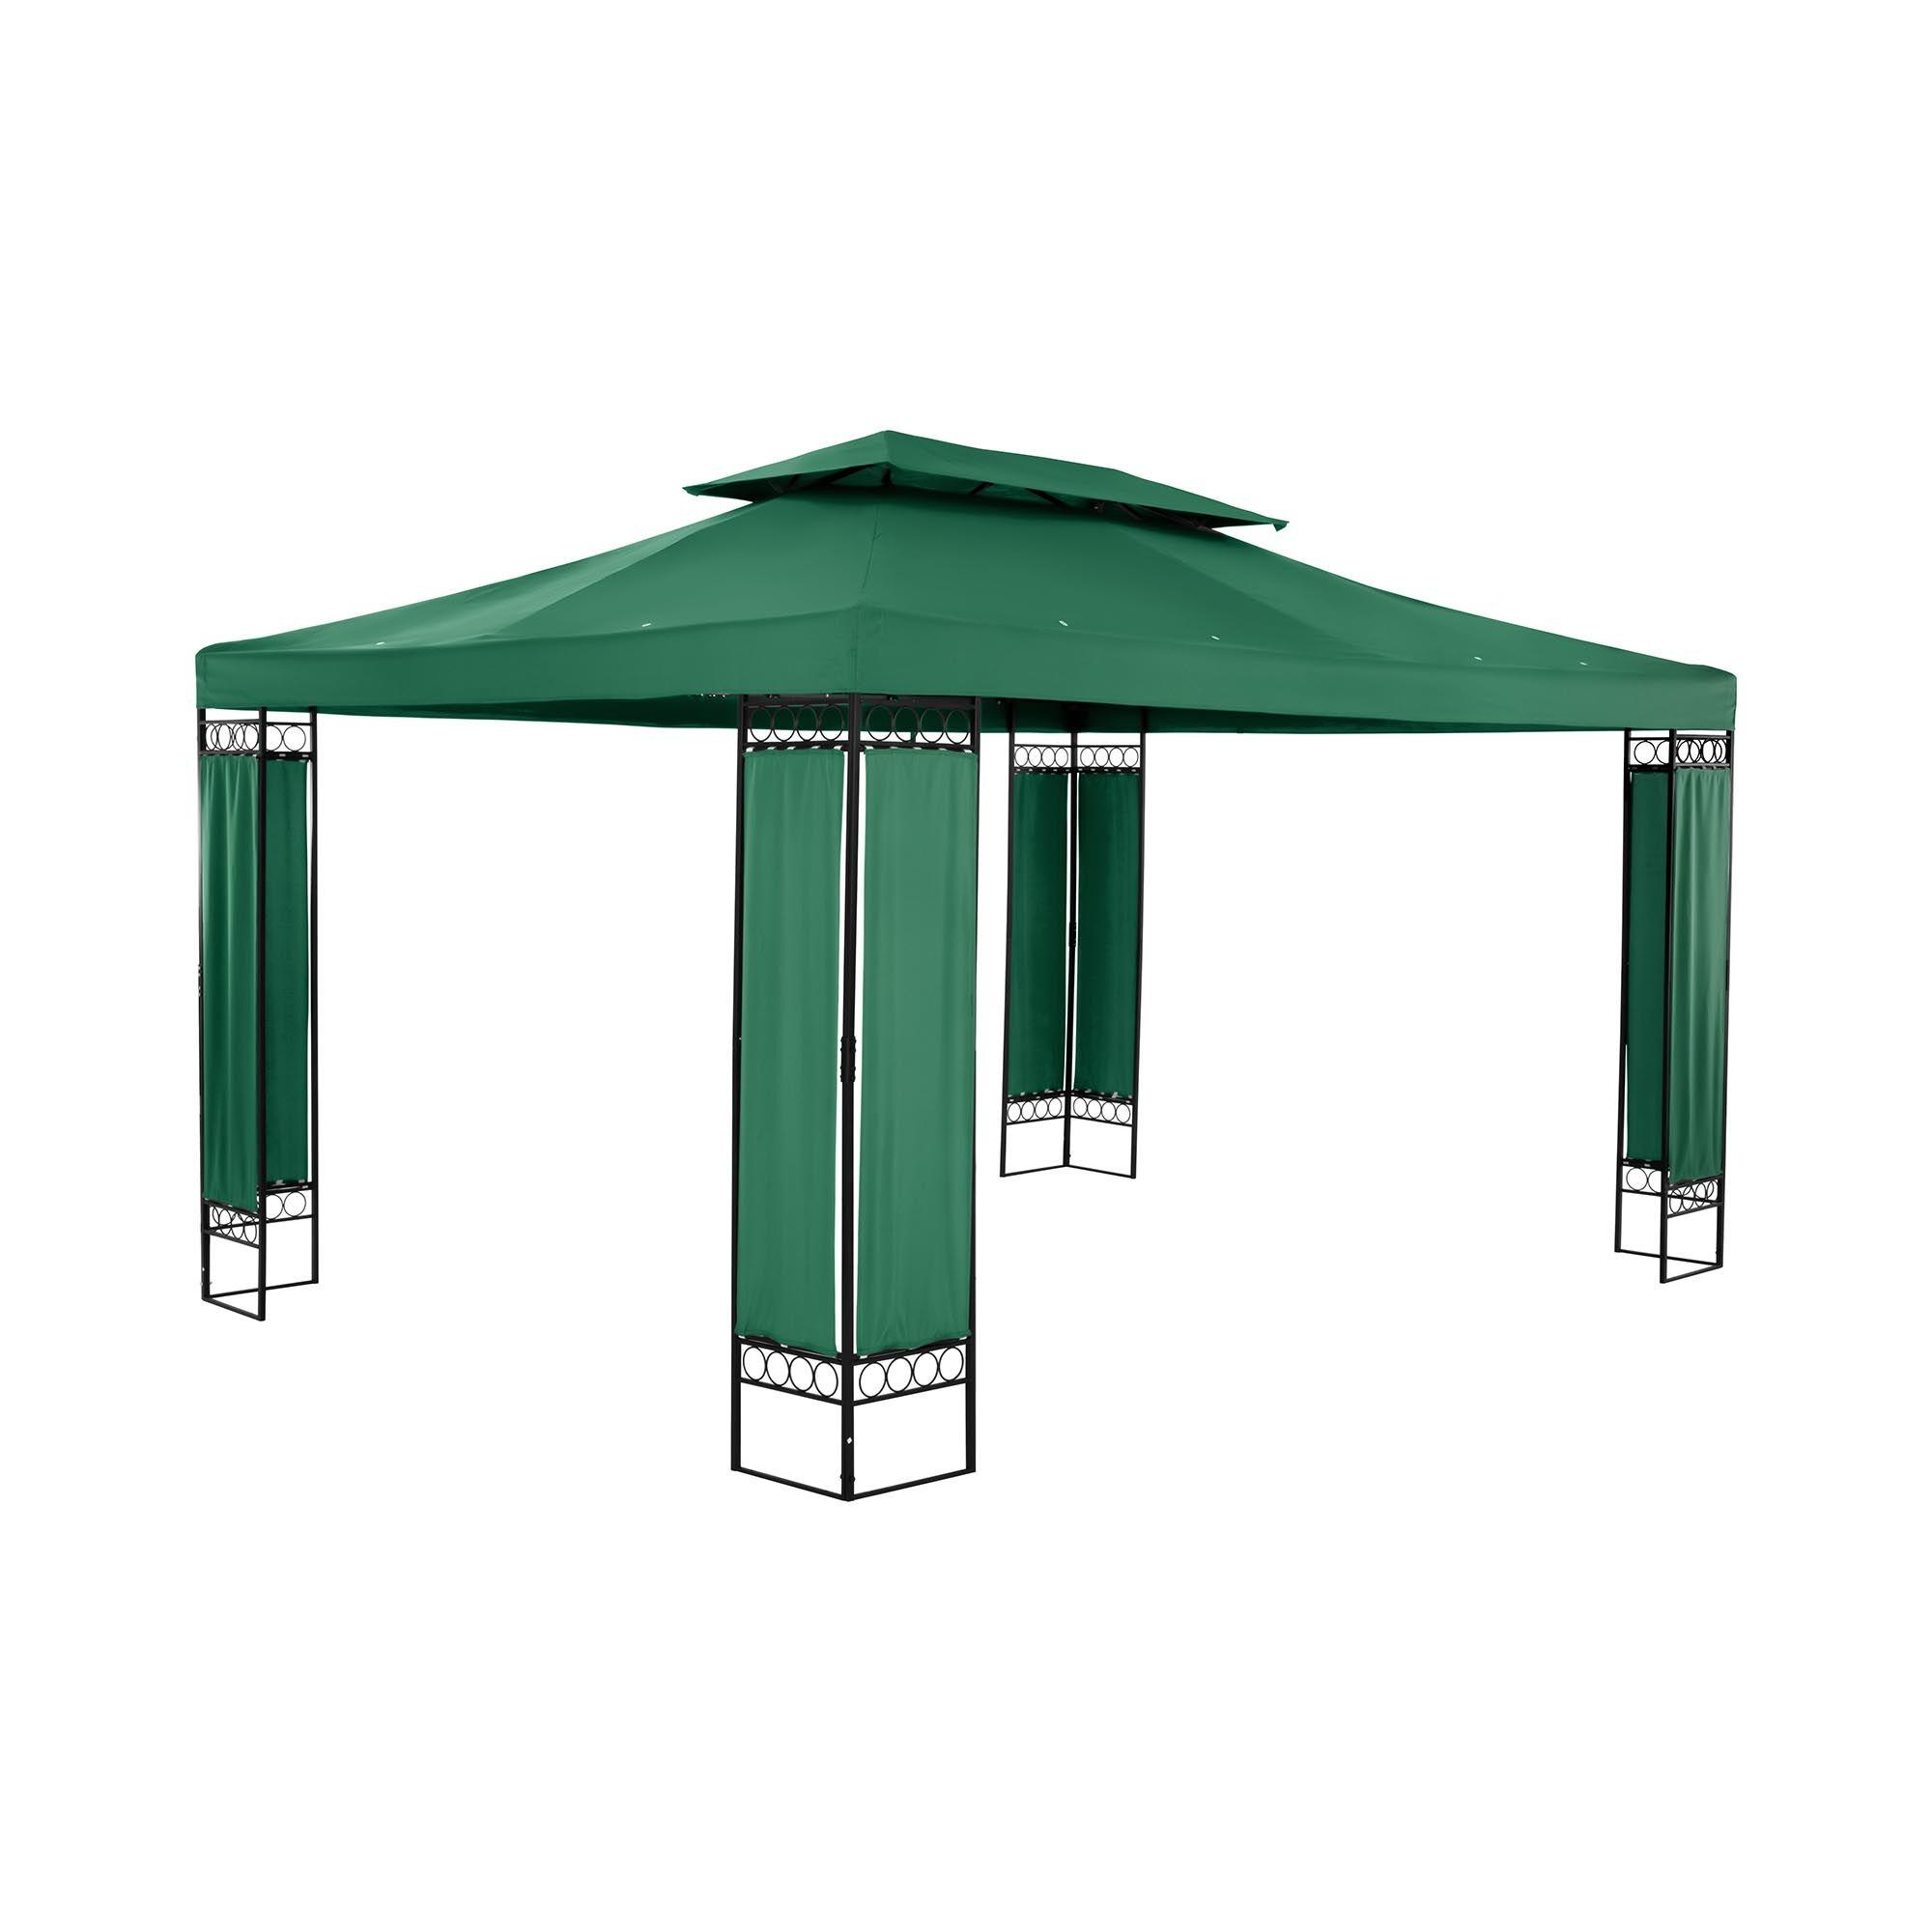 Uniprodo Gazebo da gardino - 3 x 4 m - 160 g/m² - verde scuro UNI_PERGOLA_3X4GF